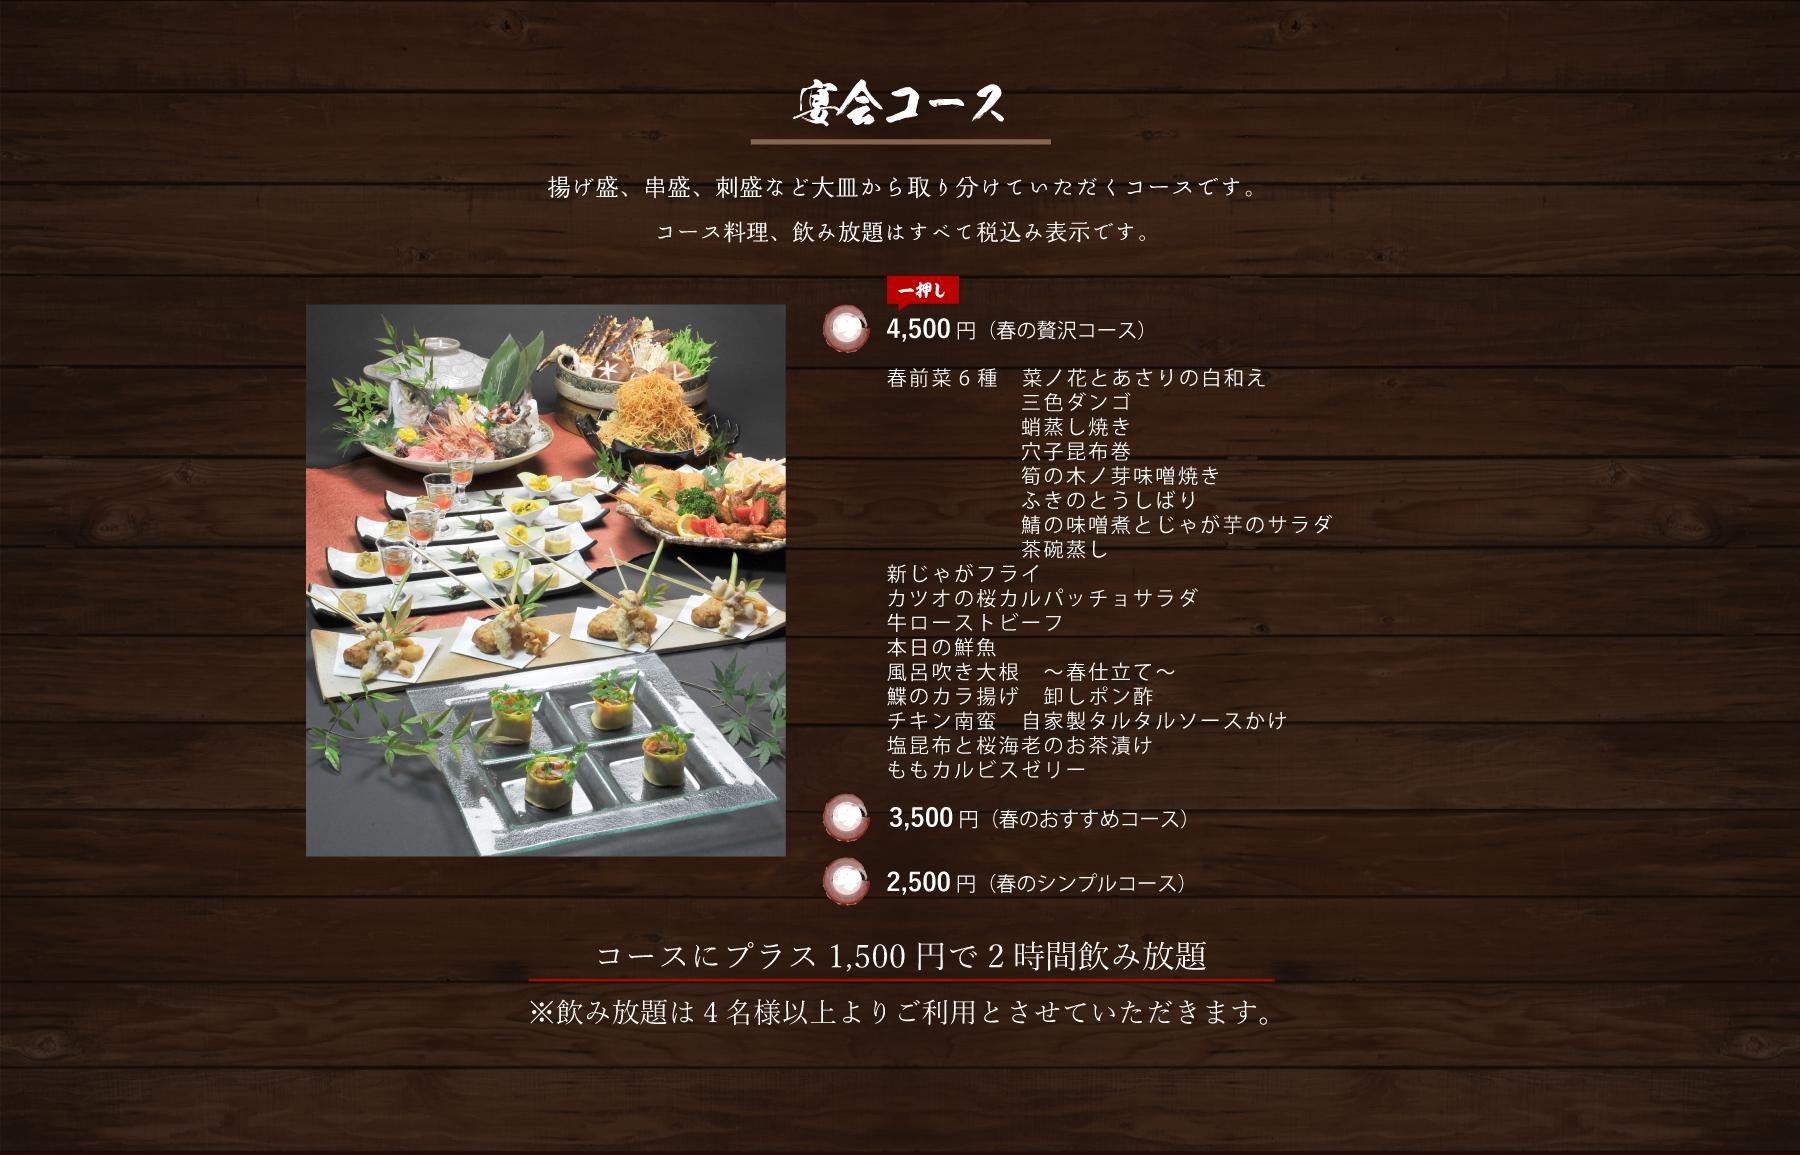 宴会コース詳細